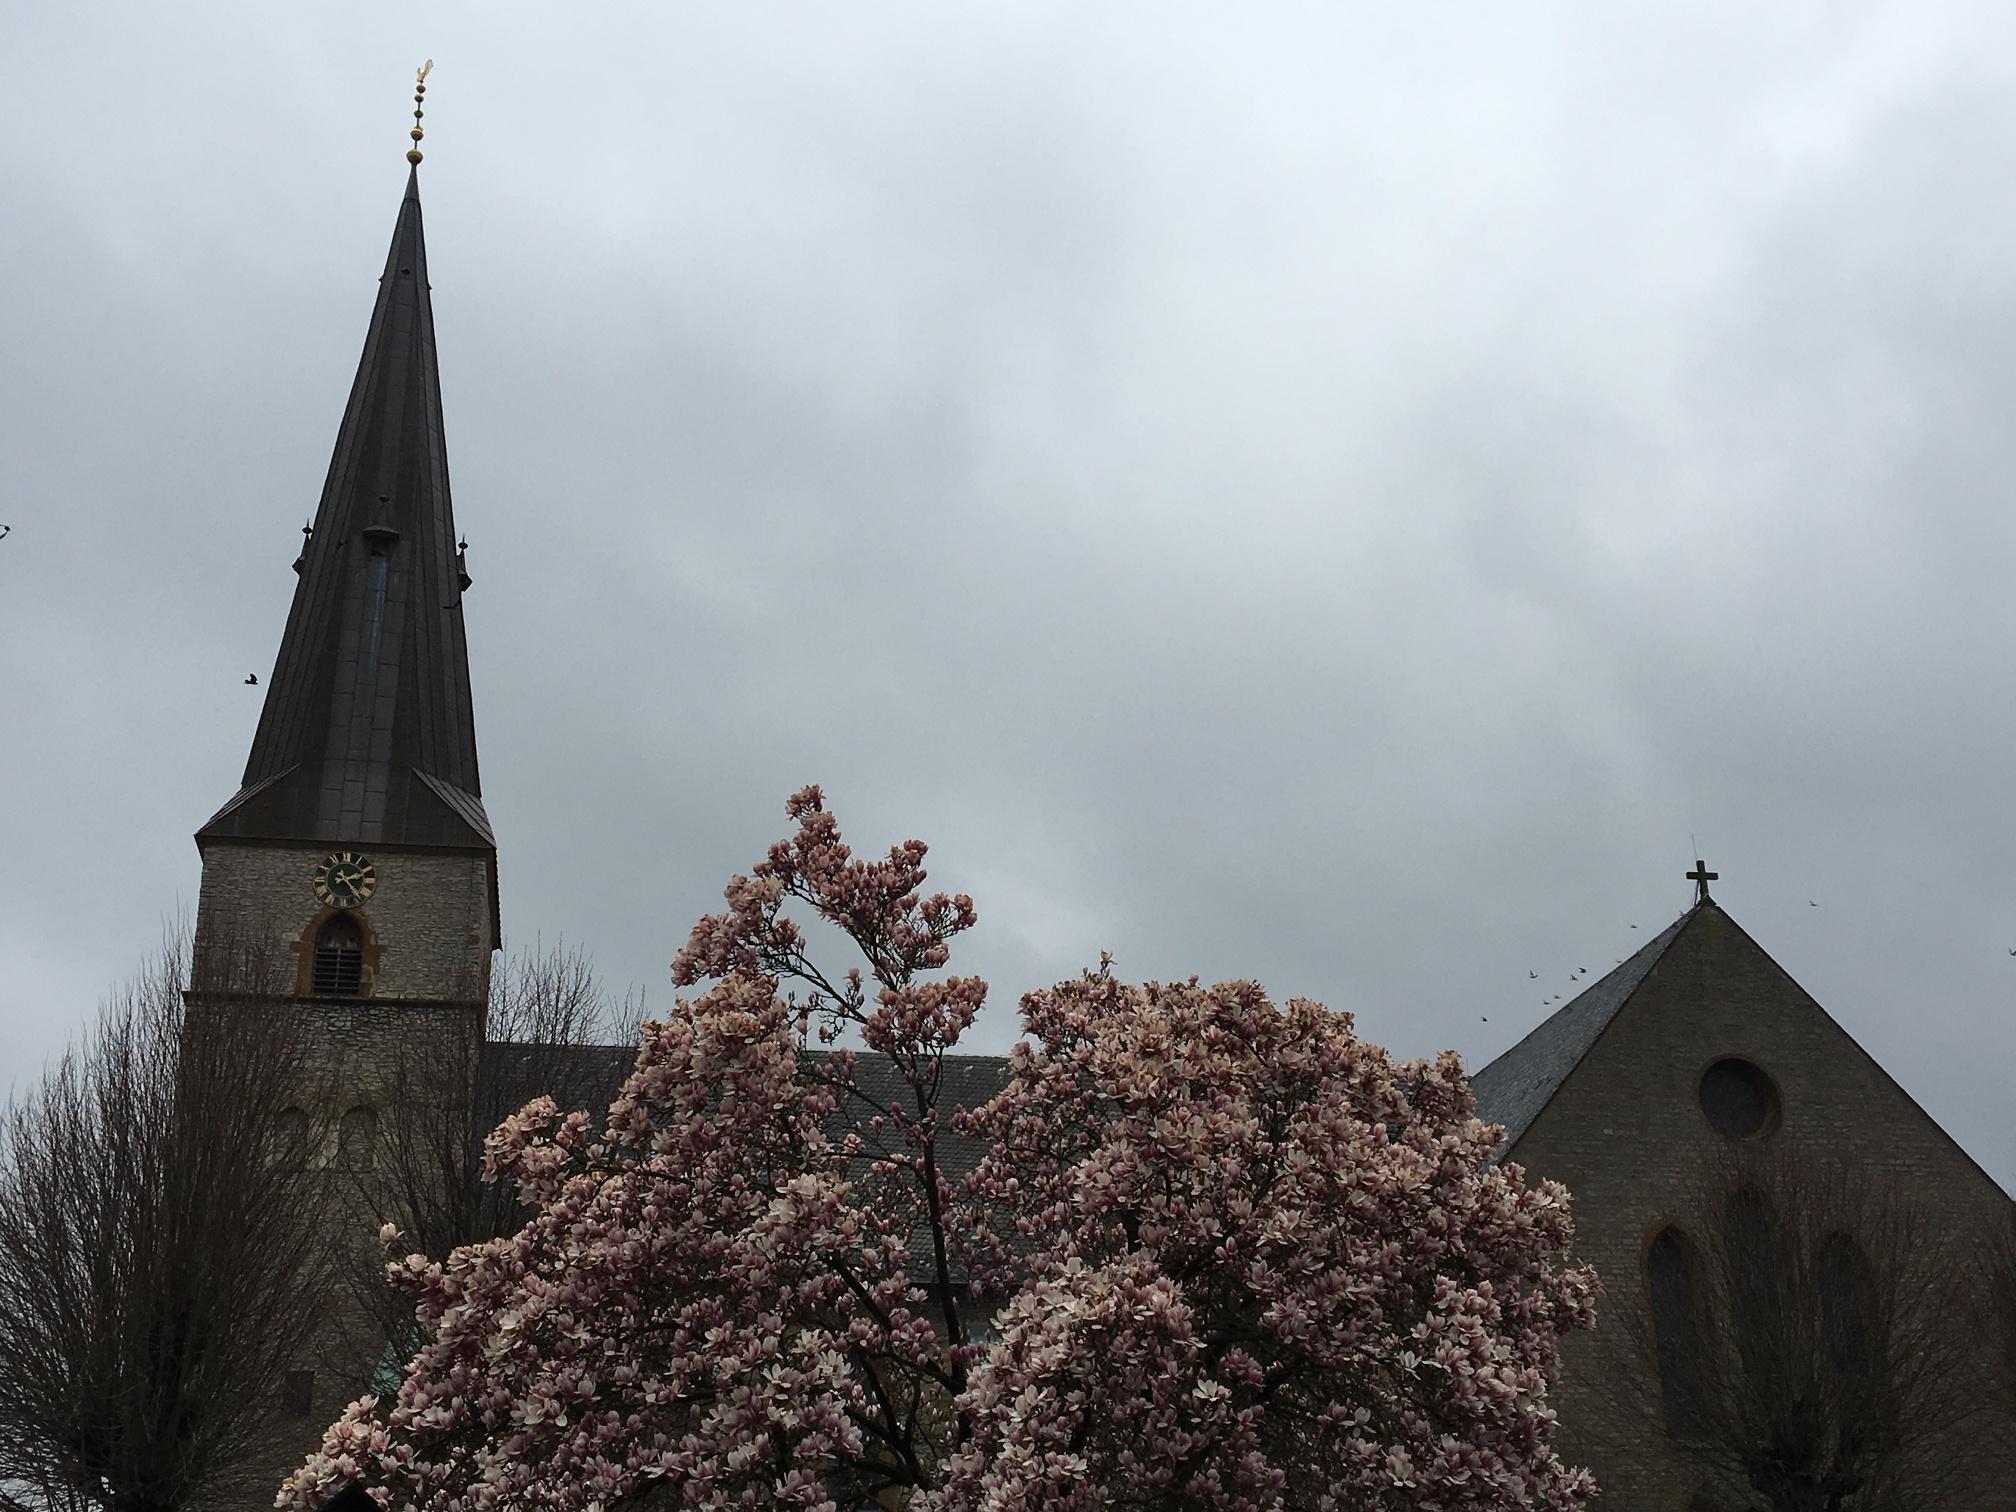 Magnolienblüte an der St. Jacobi Kirche in Werther (Westf.)